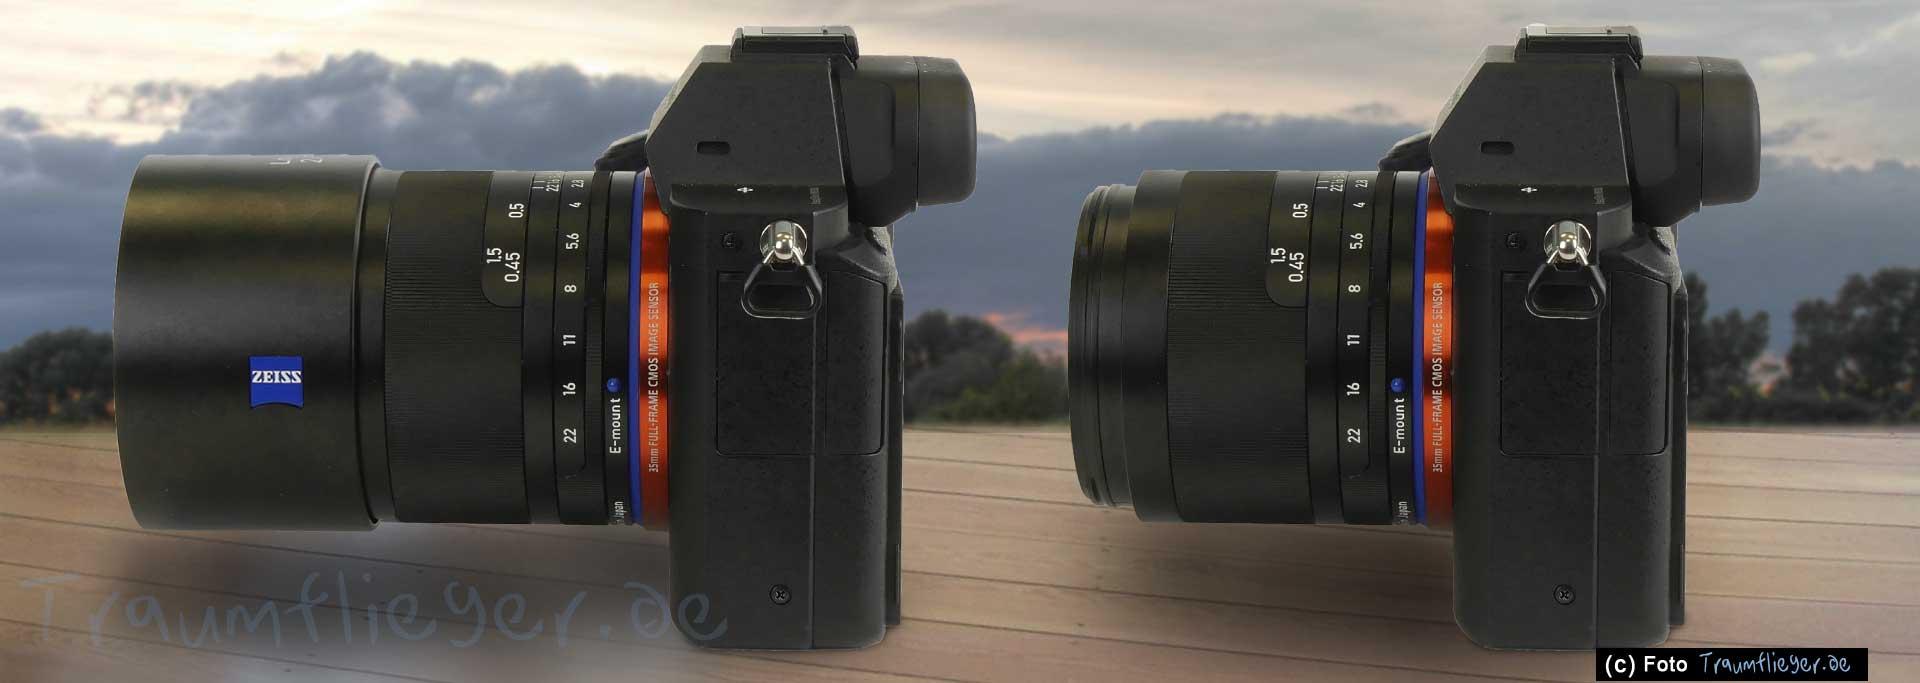 Zeiss Loxia 50mm / f2 im Test an Sony A7-Modellen - Traumflieger.de